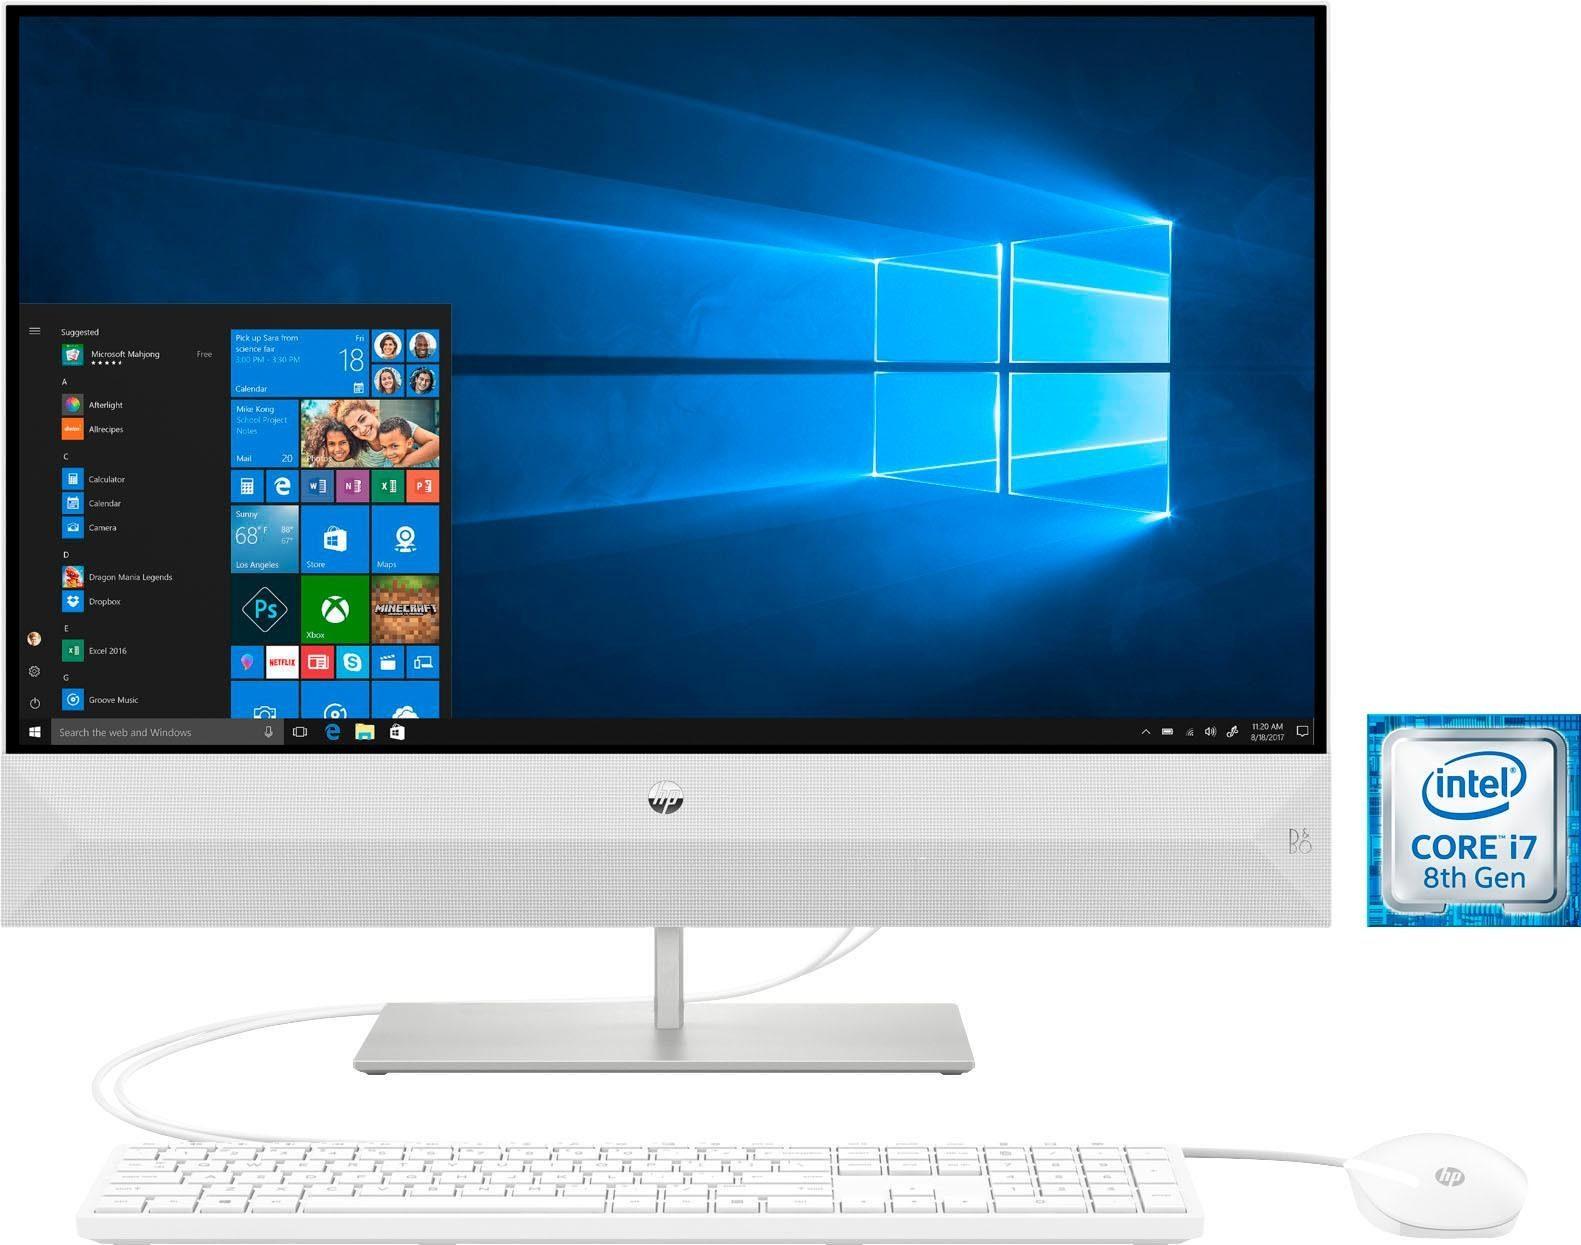 HP 27-xa0002ng All-in-One PC (Core i7, 8 GB RAM, 1000 GB HDD, 128 GB SSD)